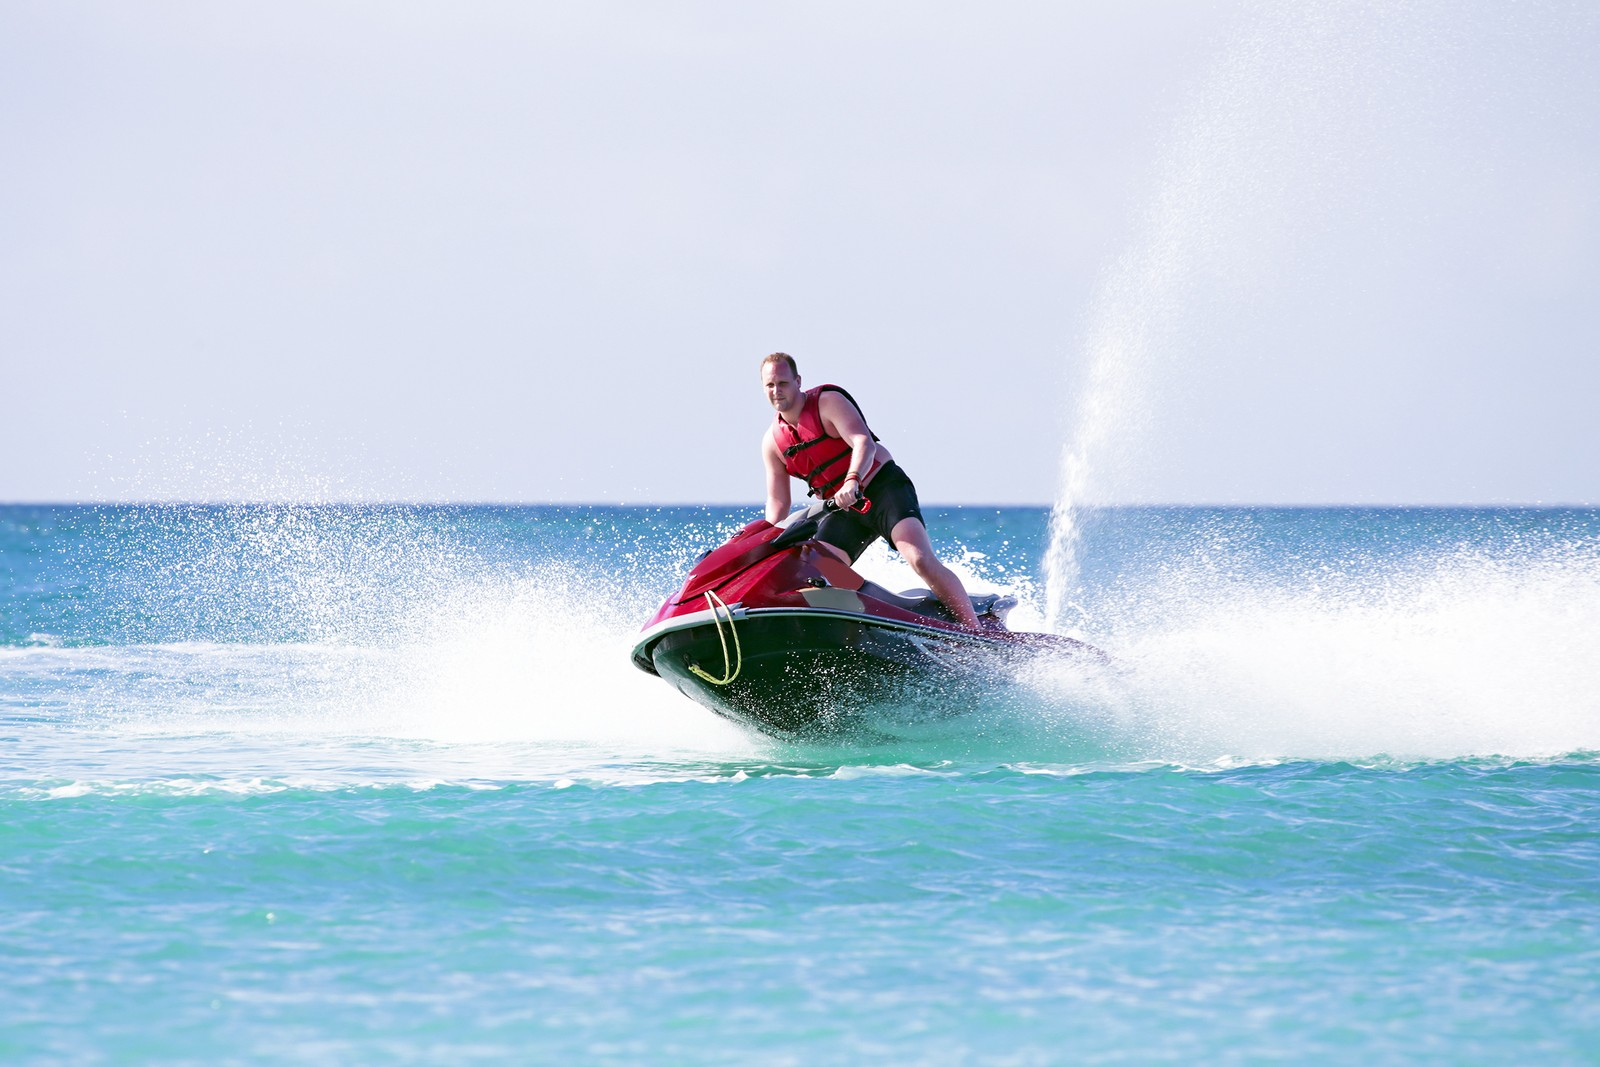 Tourist Jet skiing at Boracay